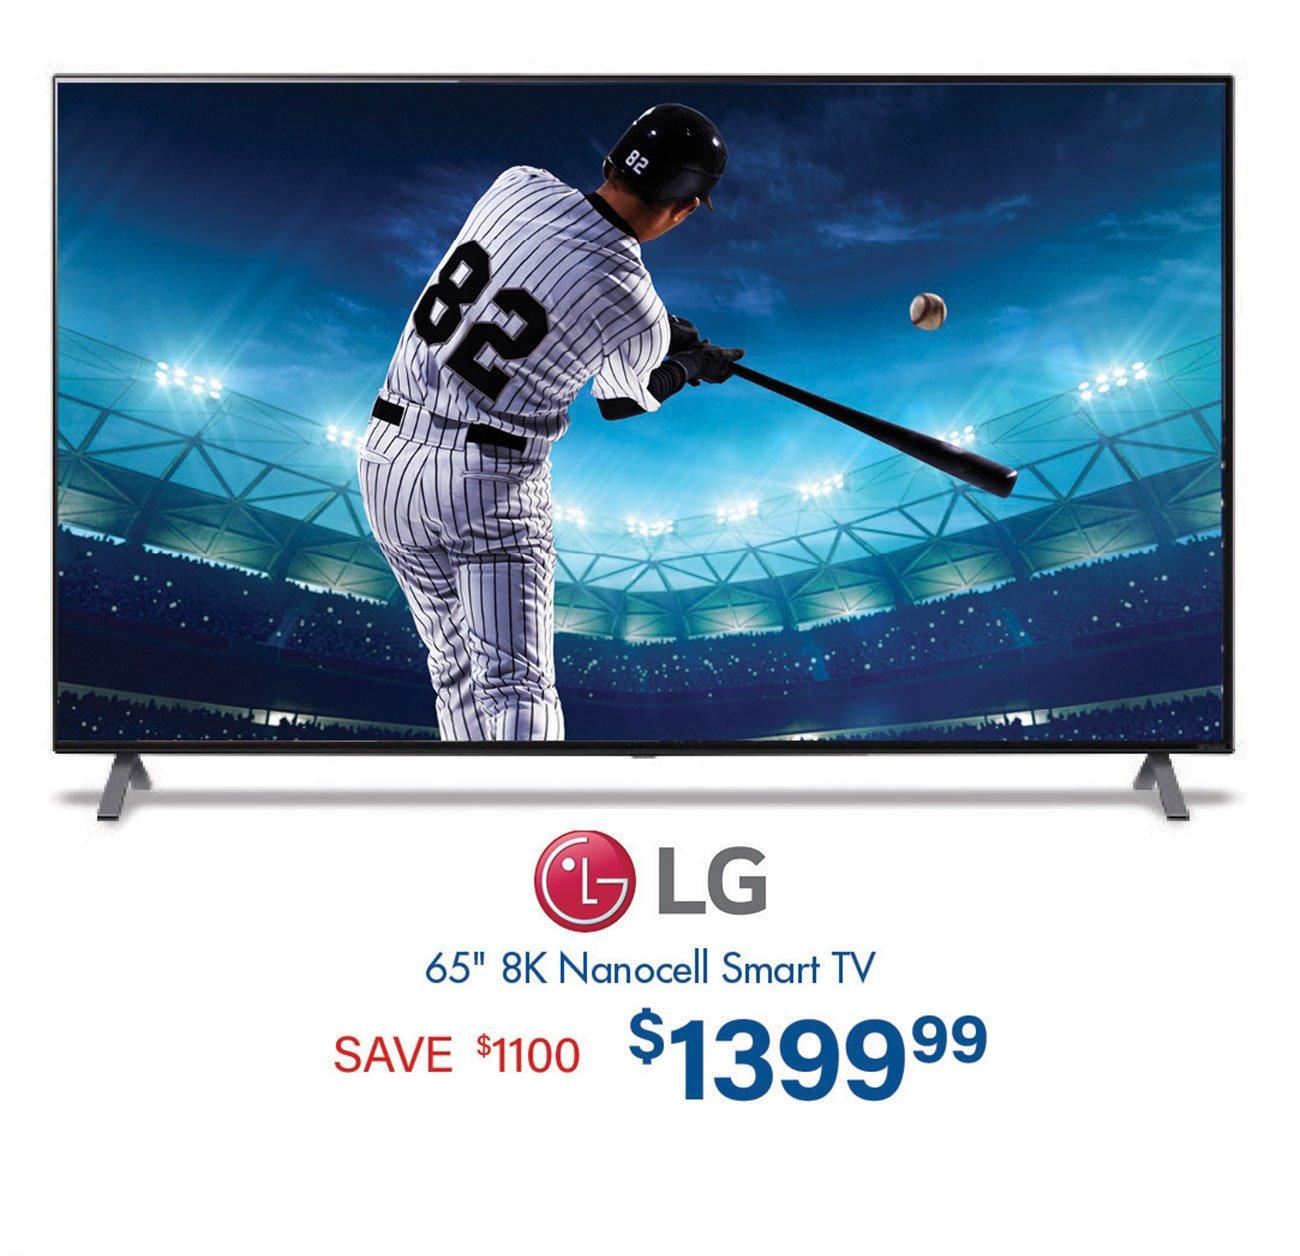 LG-65-8K-Nanocell-Smart-TV-UIRV